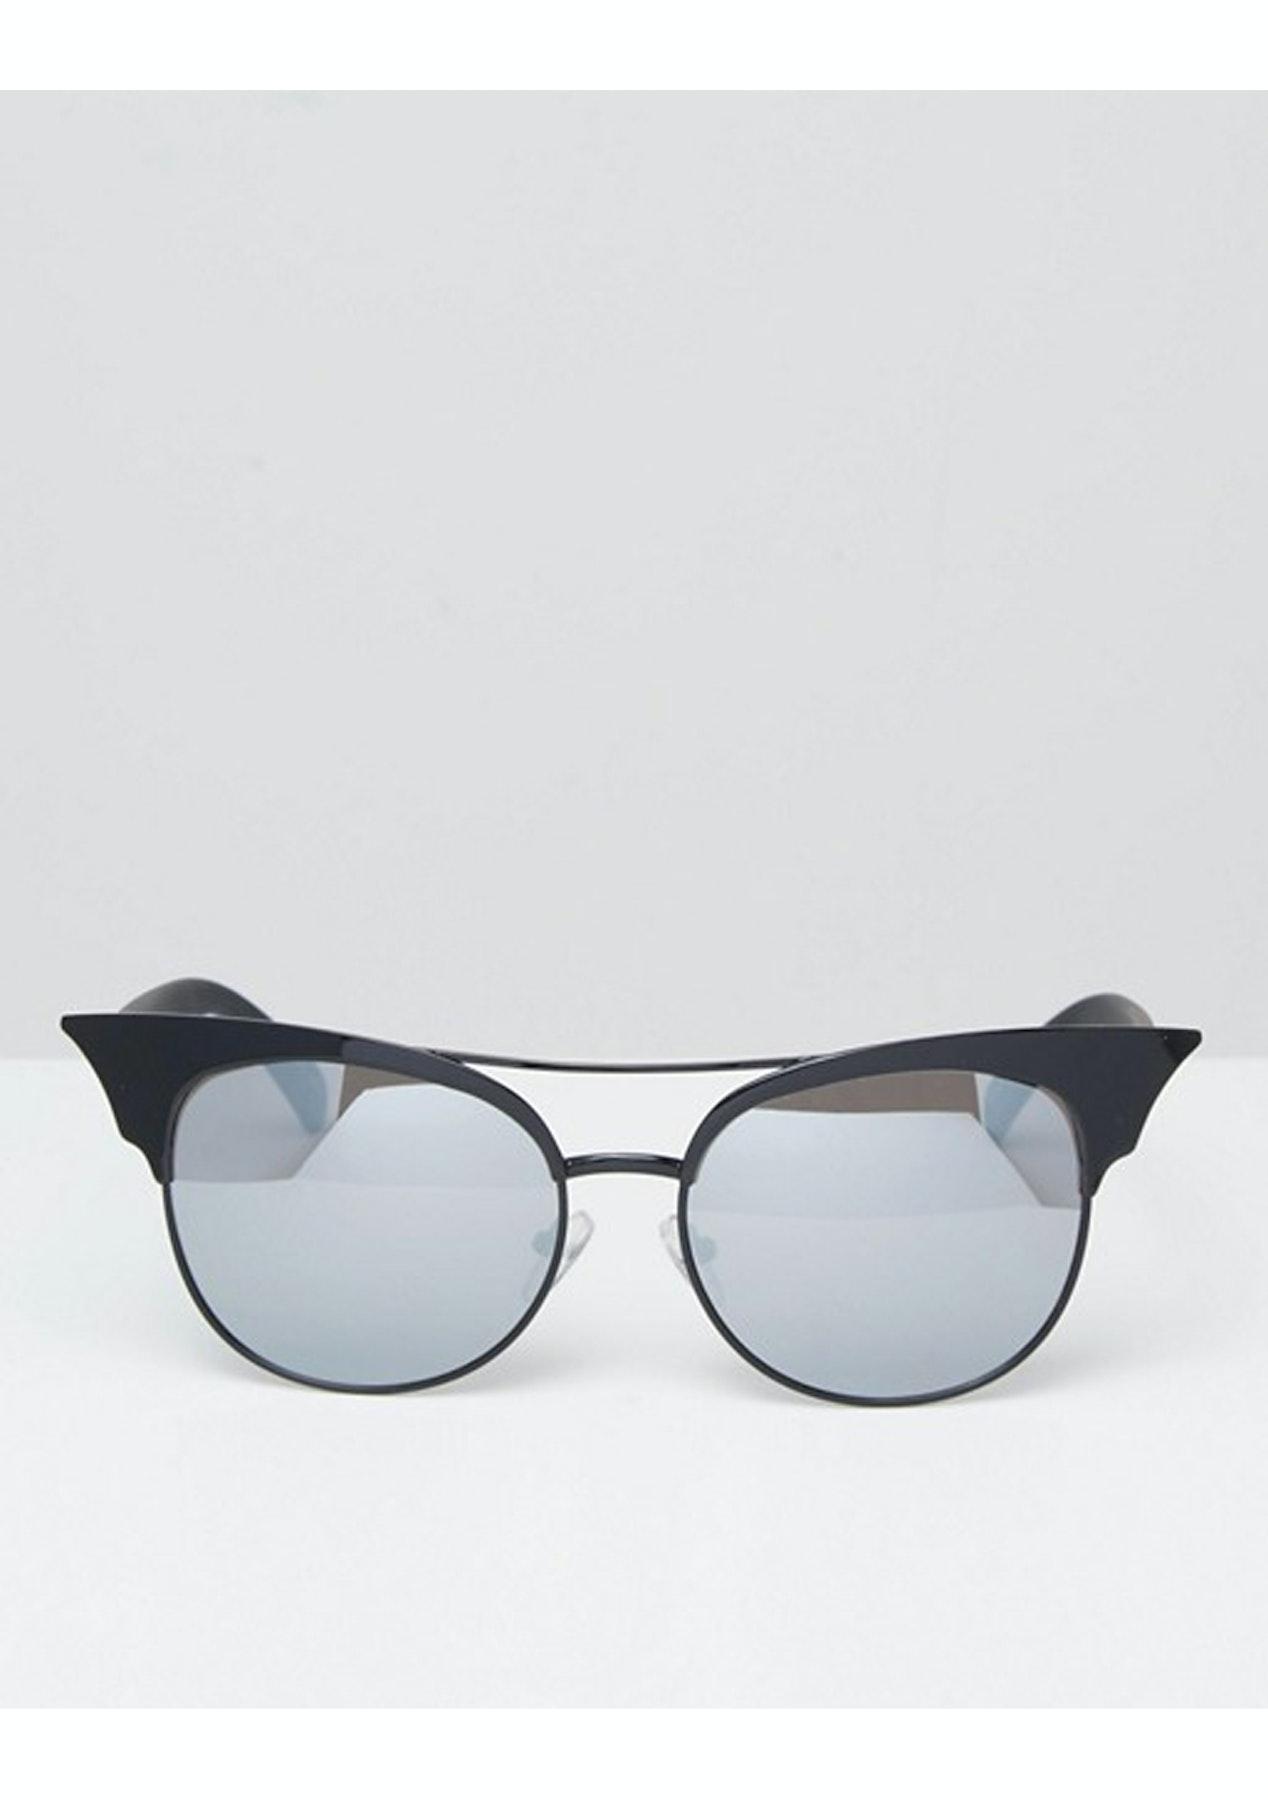 dab77c8086 Quay Australia Zig Sunglasses - Black Silver Mirror - Quay Australia Eyewear  From  29.95 - Onceit